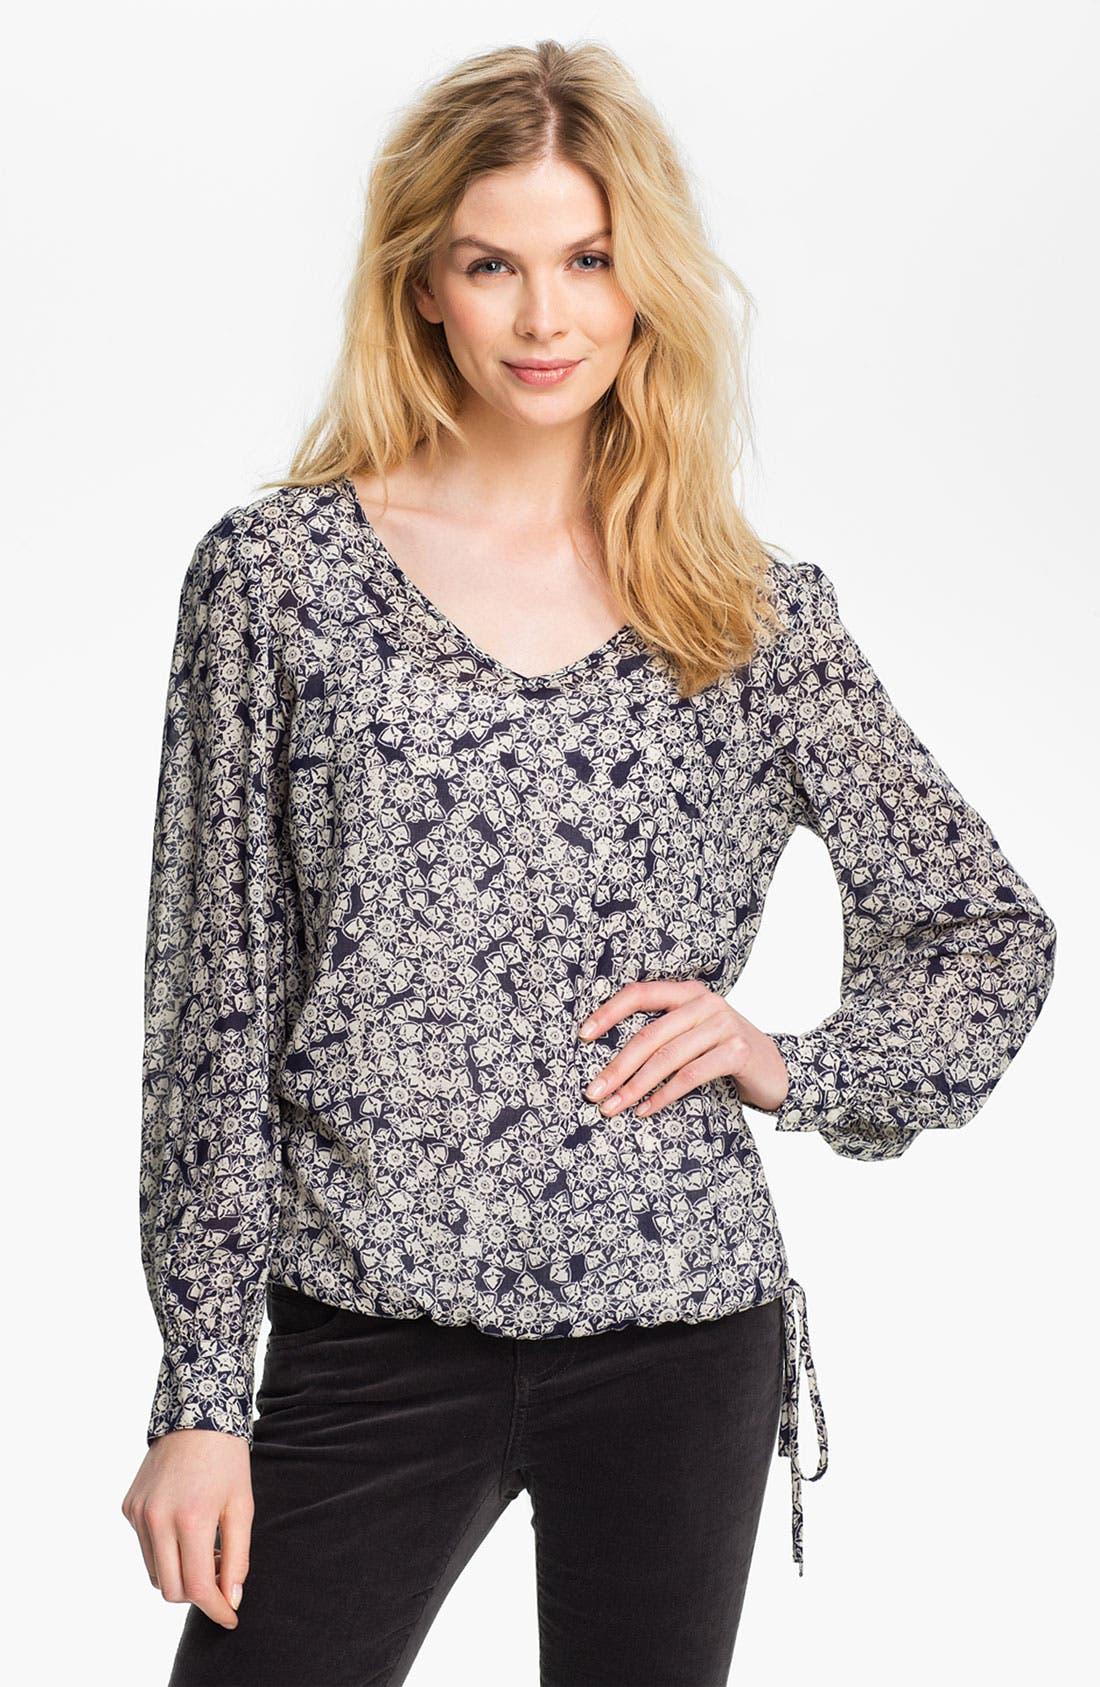 Alternate Image 1 Selected - Lucky Brand 'Farrah' Print Blouse